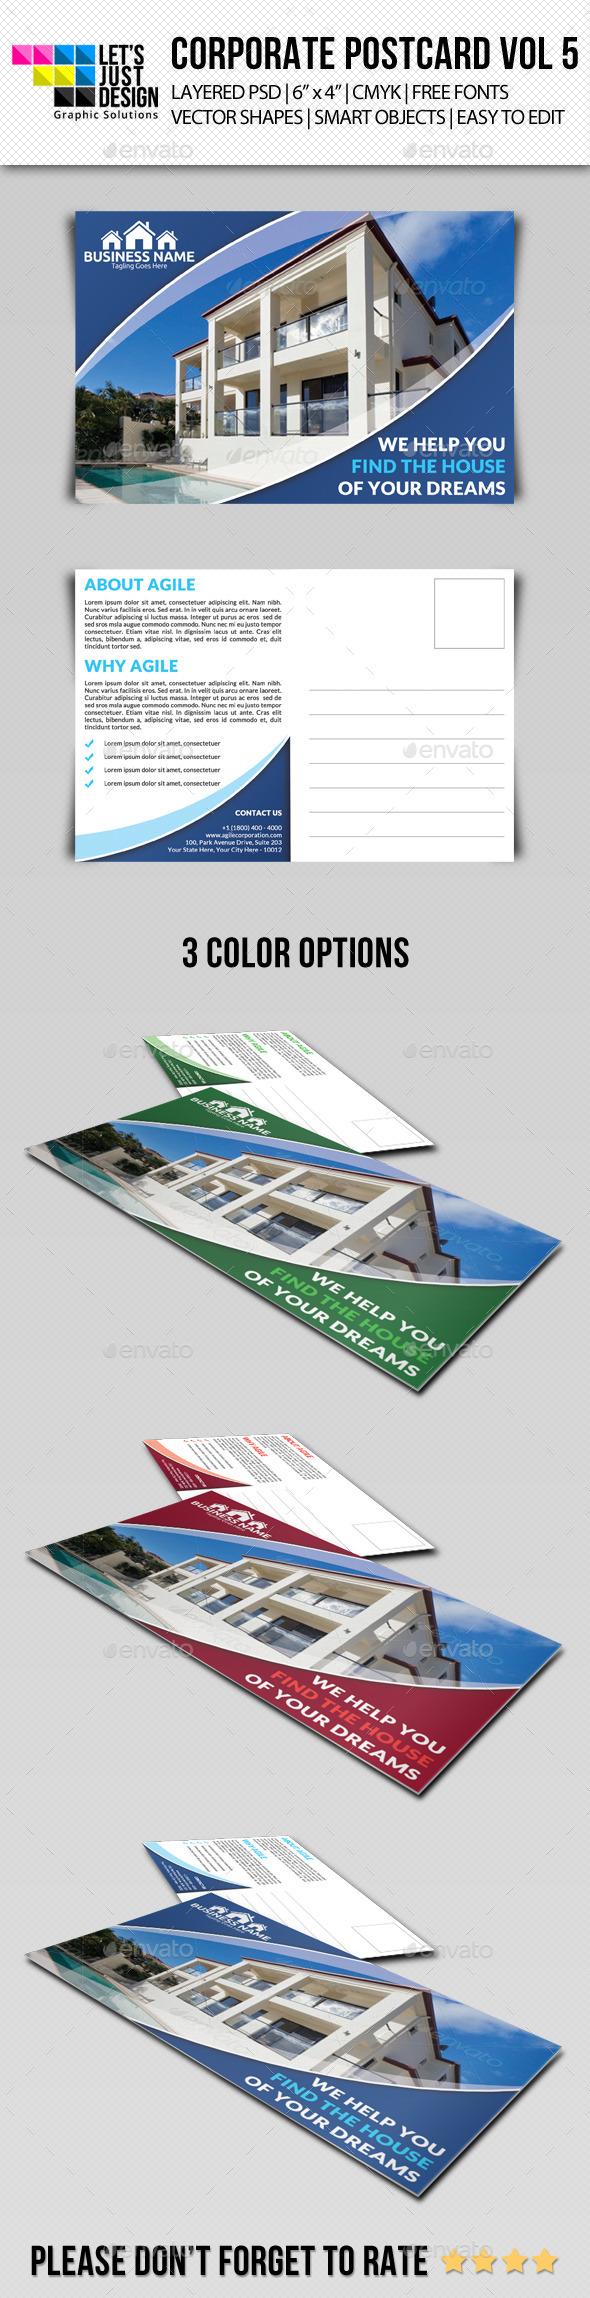 Corporate Postcard Template Vol 5 - Cards & Invites Print Templates